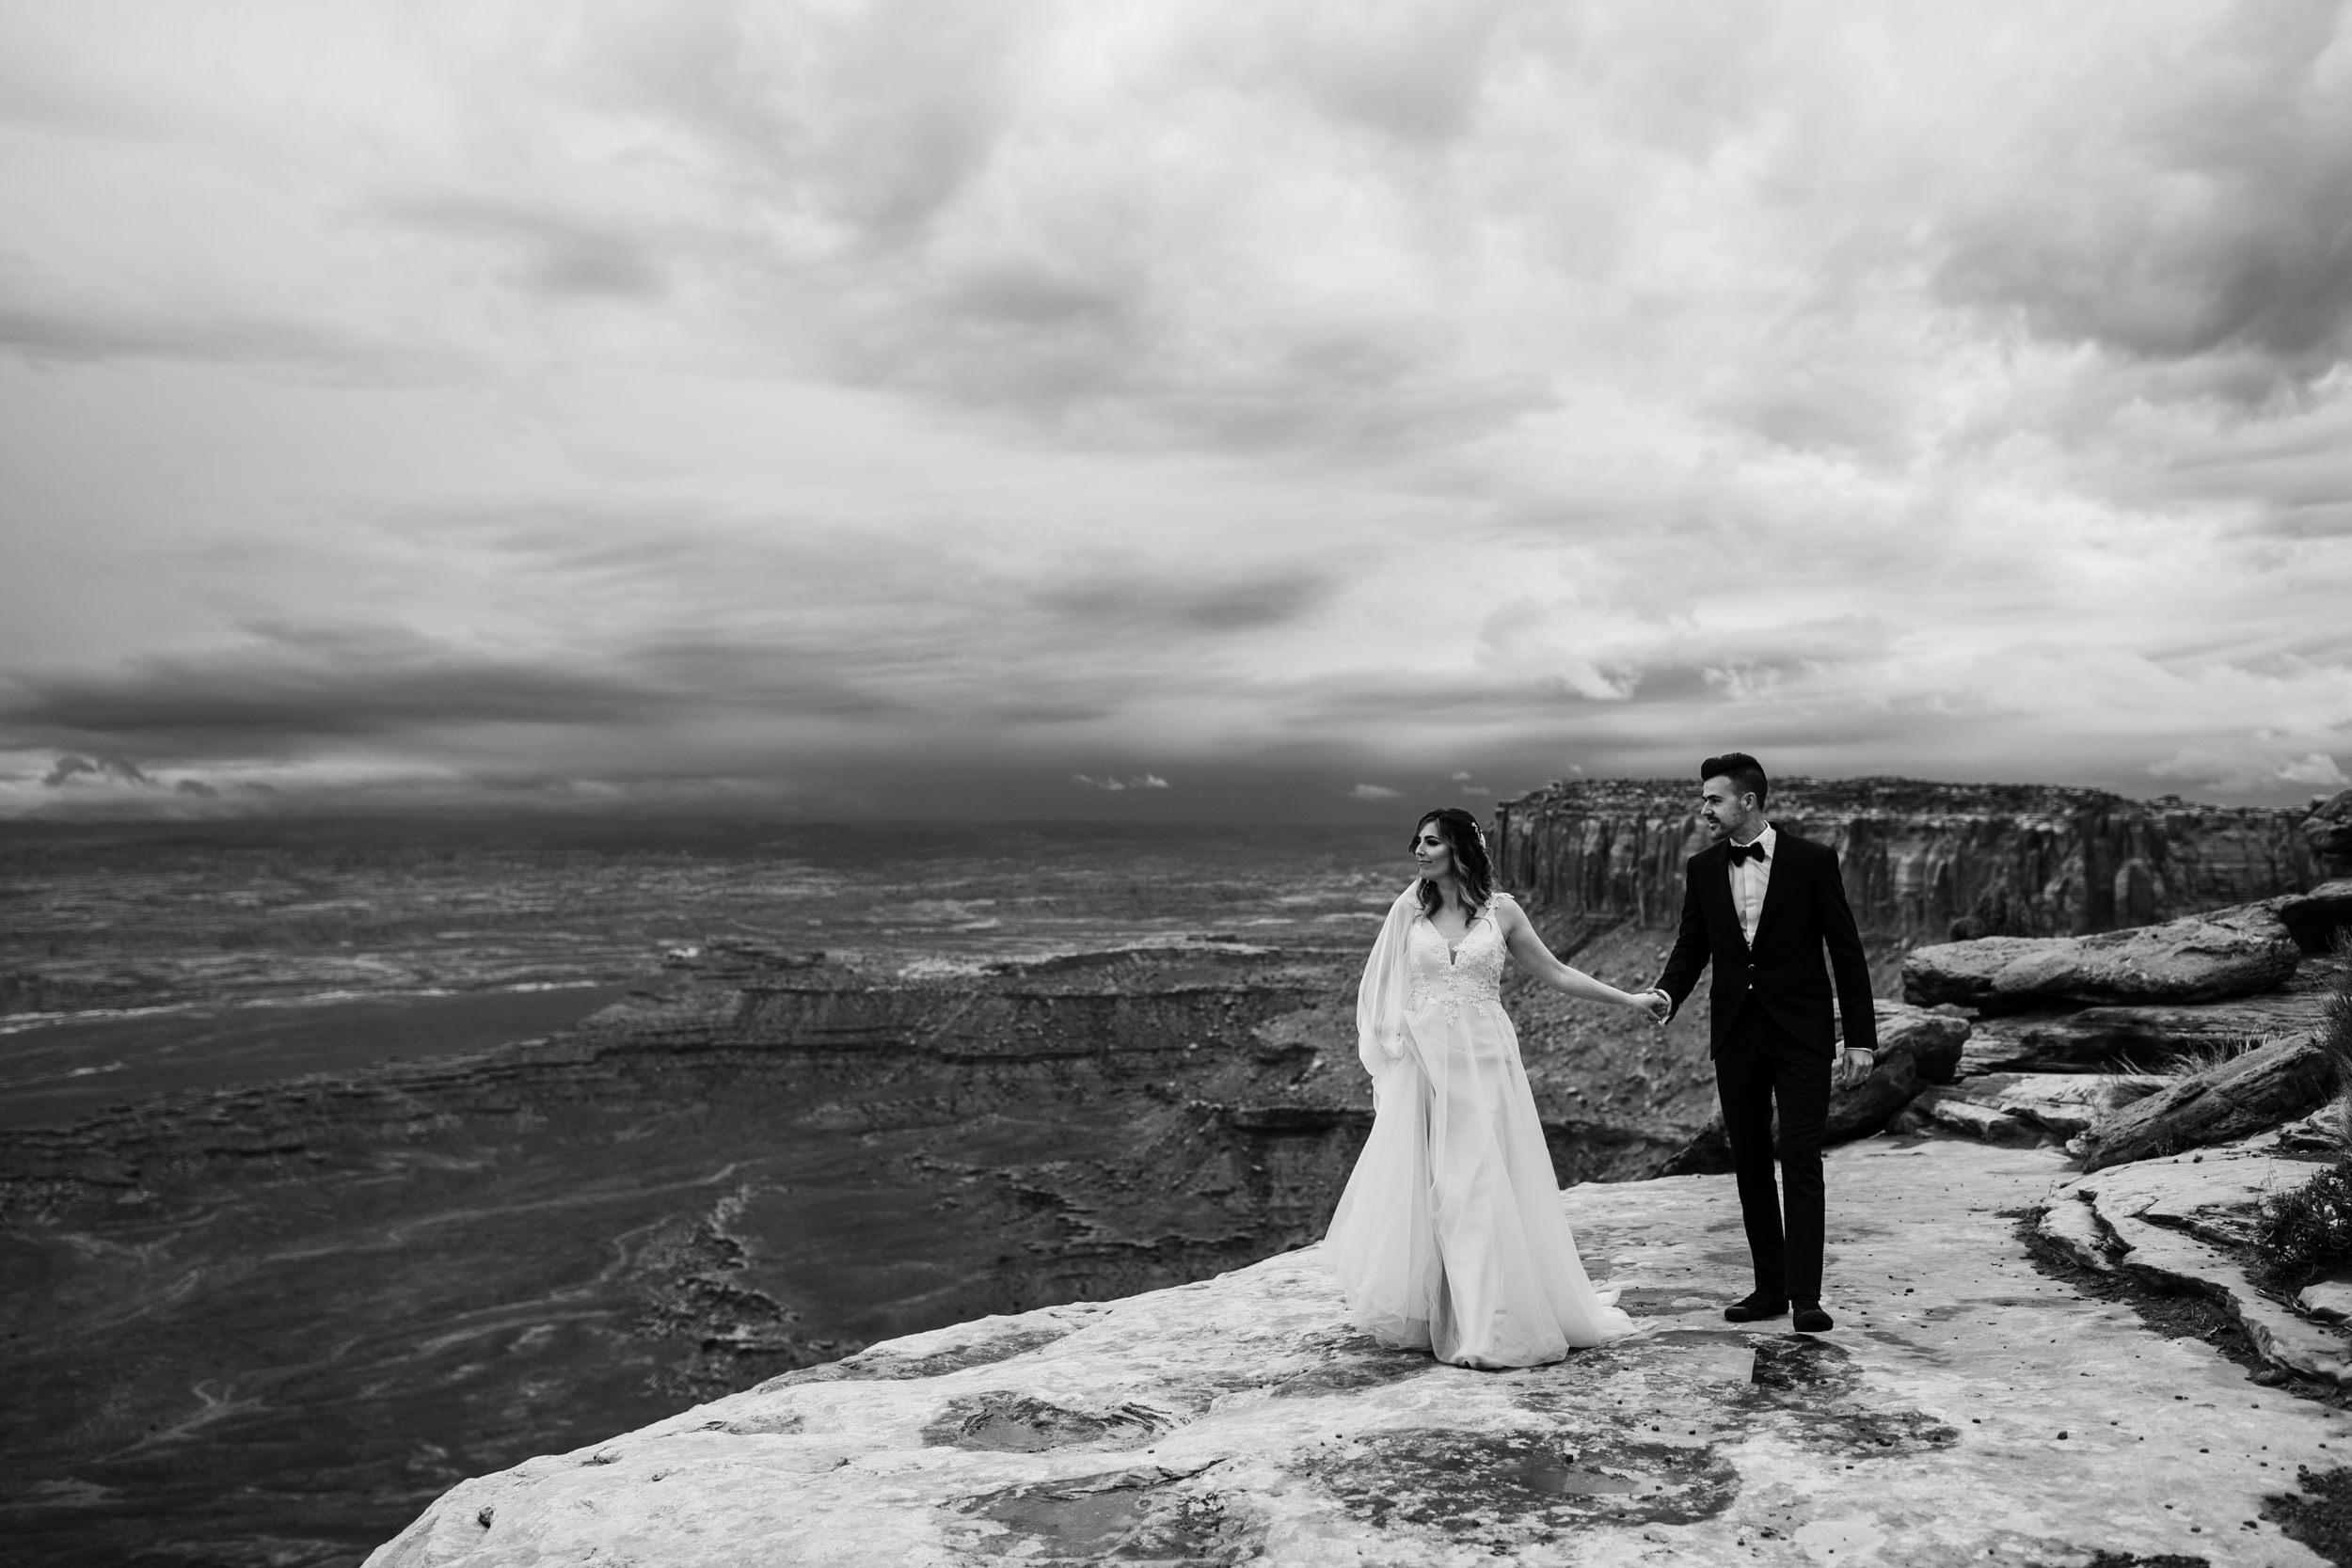 Hearnes-Elopement-Photography-Canyonlands-National-Park-Moab-Wedding-9.jpg